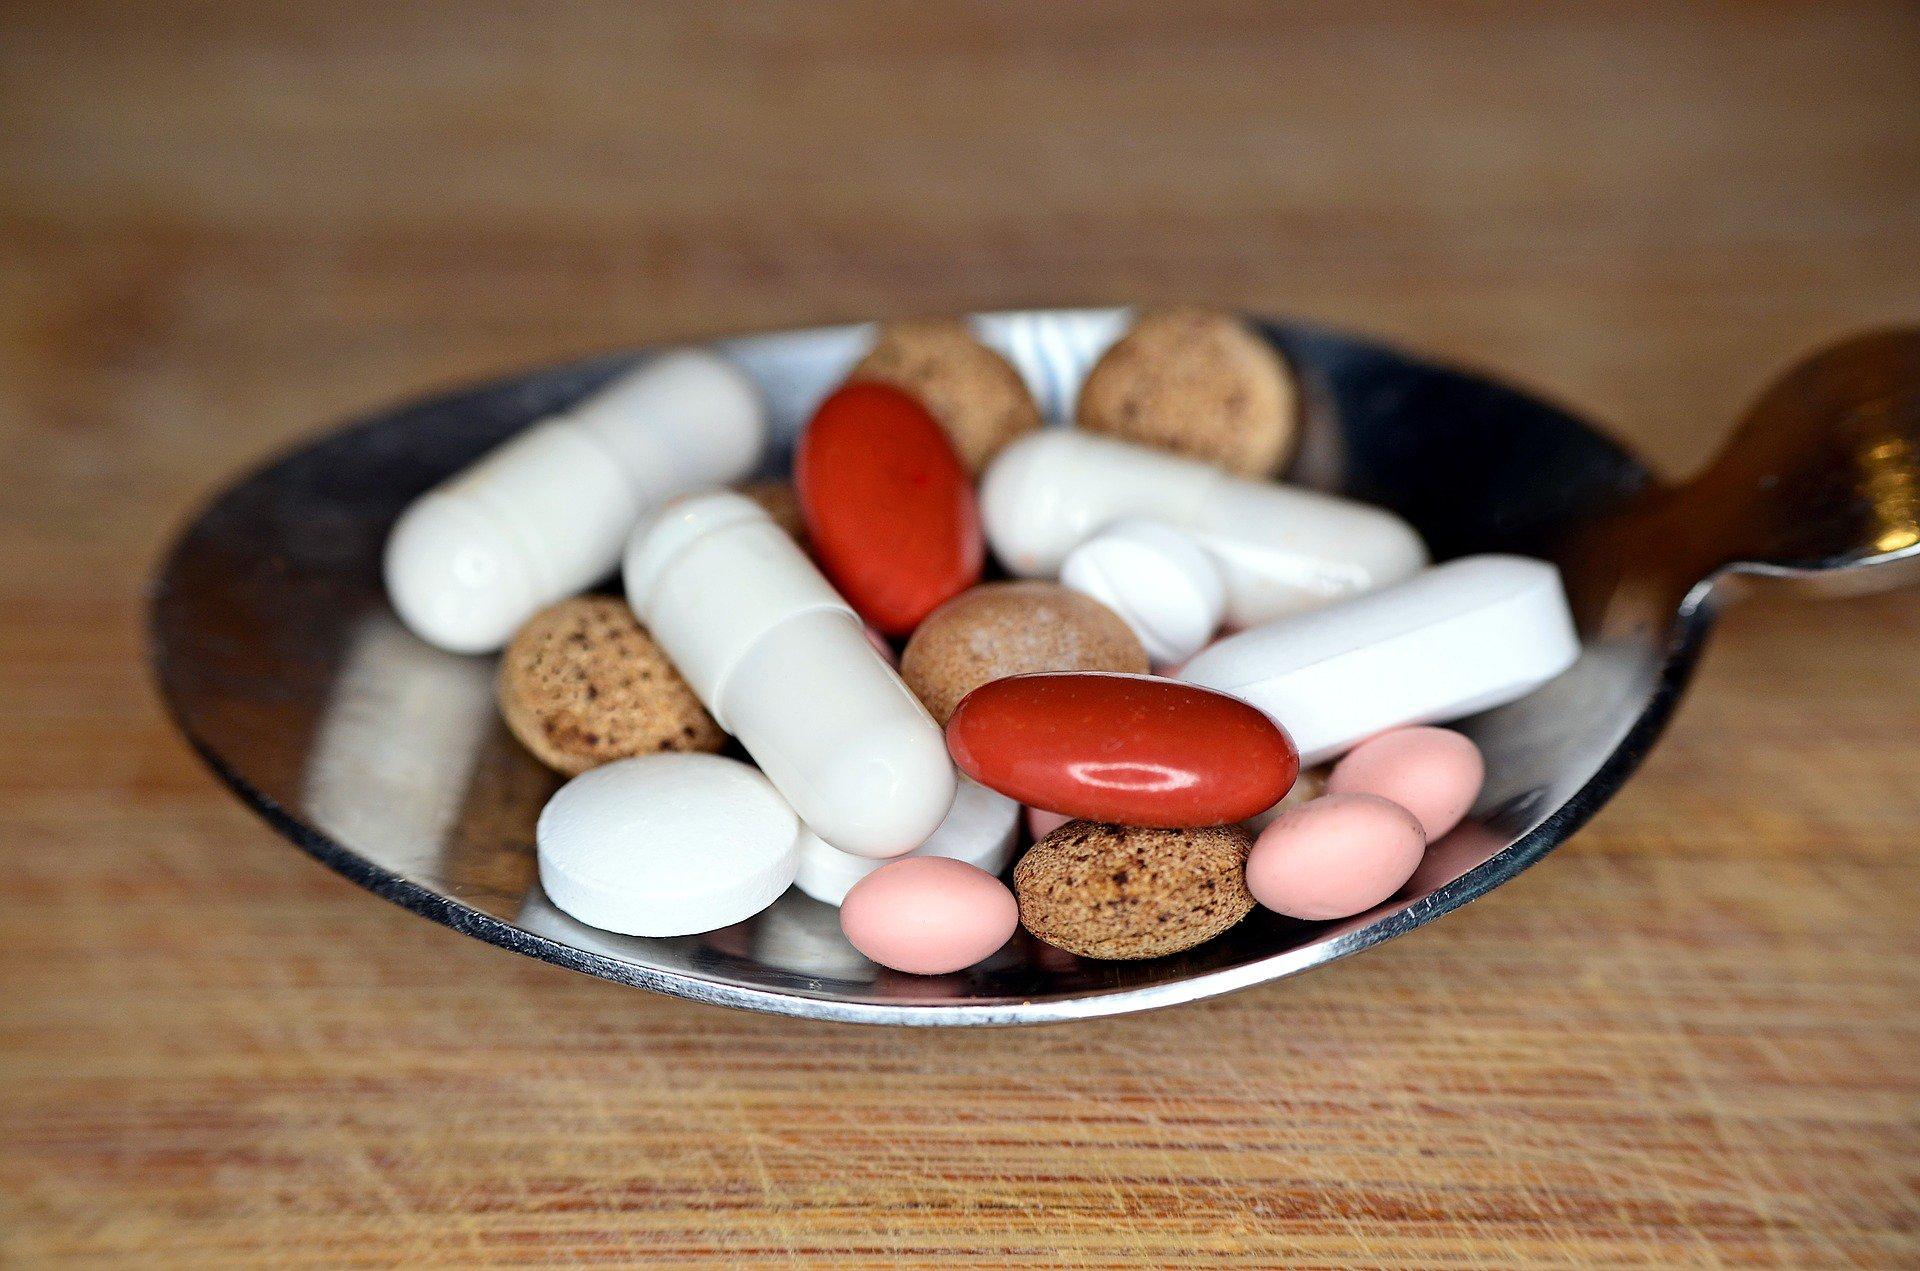 Como evitar antibiótico para o bebé?